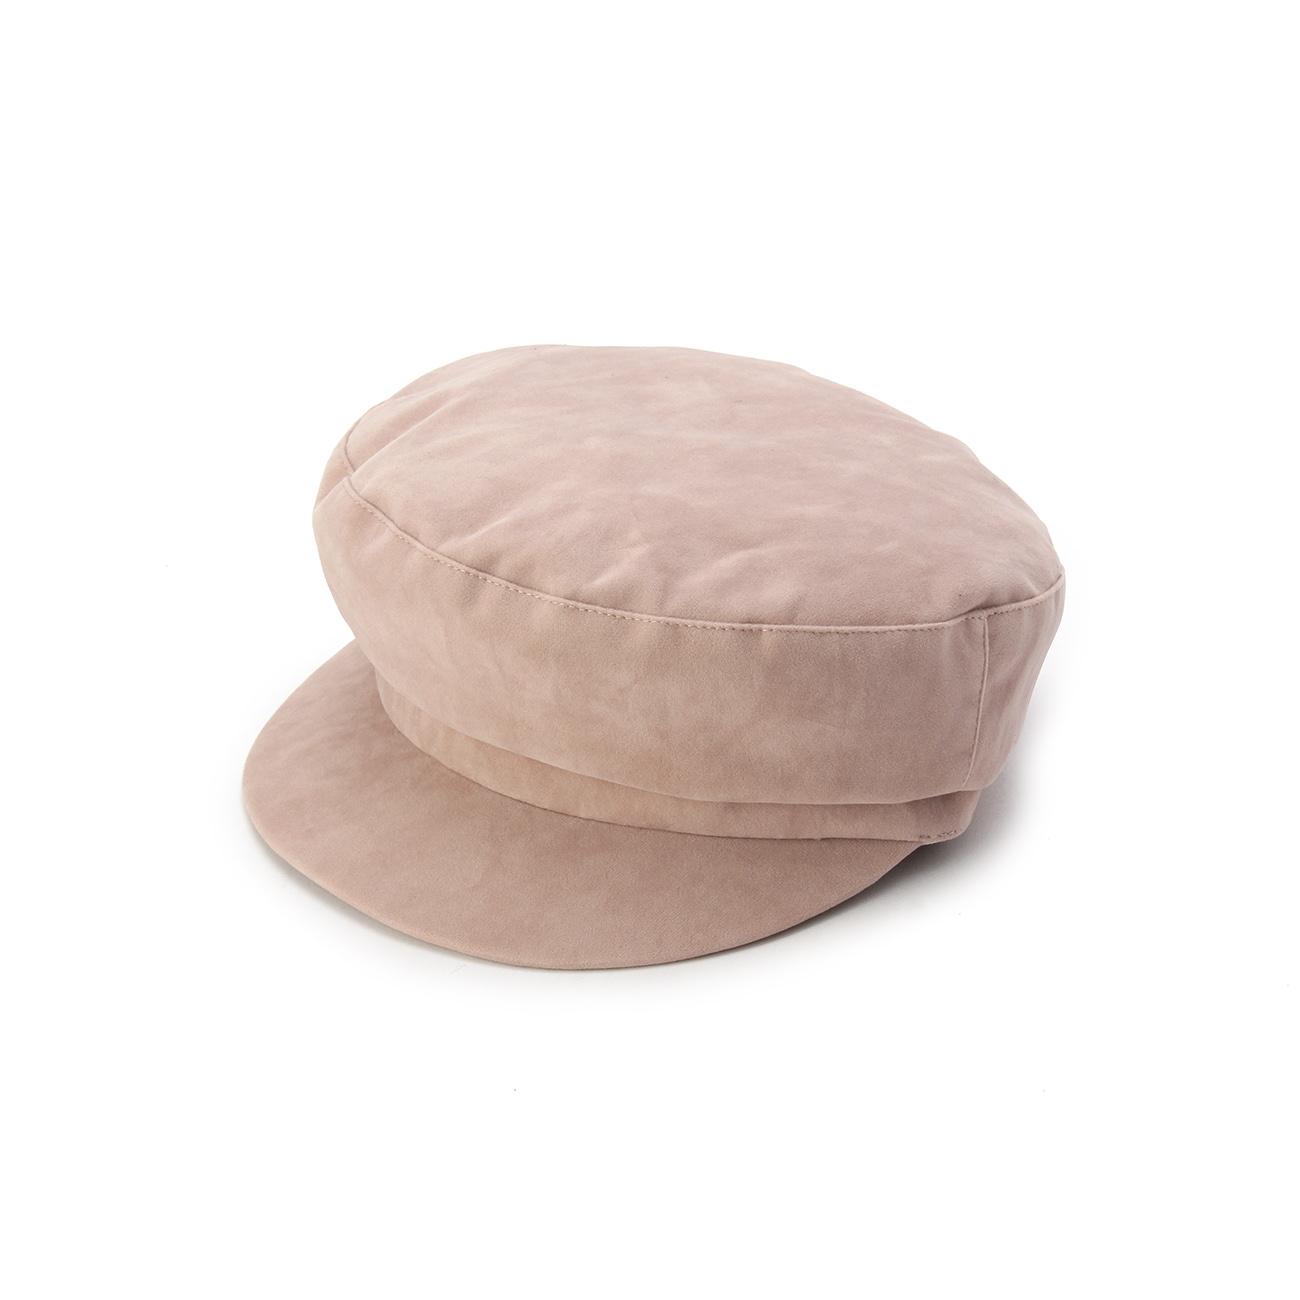 【OPAQUE.CLIP (オペークドットクリップ)】フロッキーマリンキャップレディース 帽子 キャップ ベビーピンク